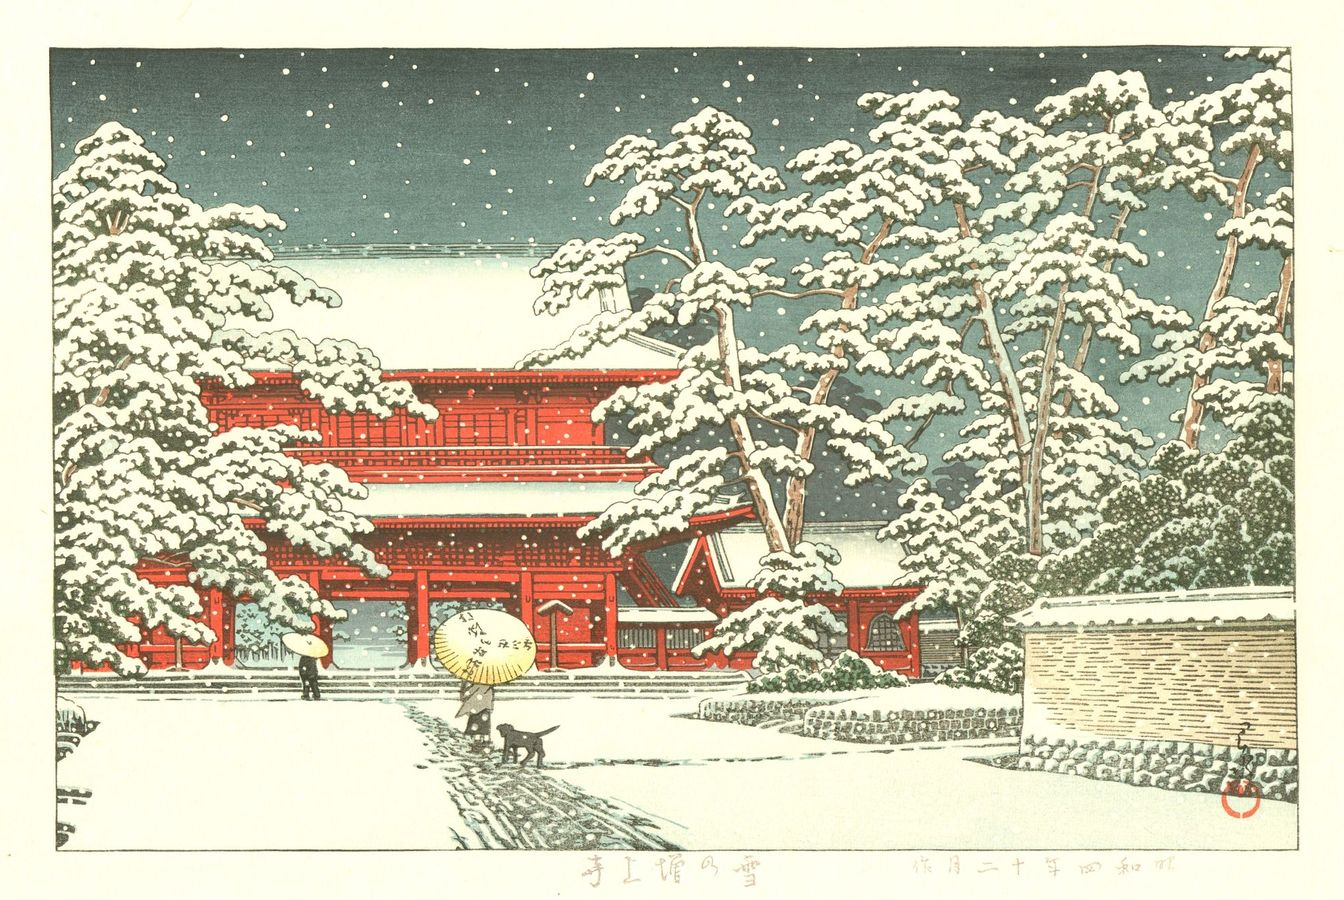 Hasui Kawase 1929 - Temple Zozoji - Editeurs Kawaguchi et Sakai puis Shobisha.